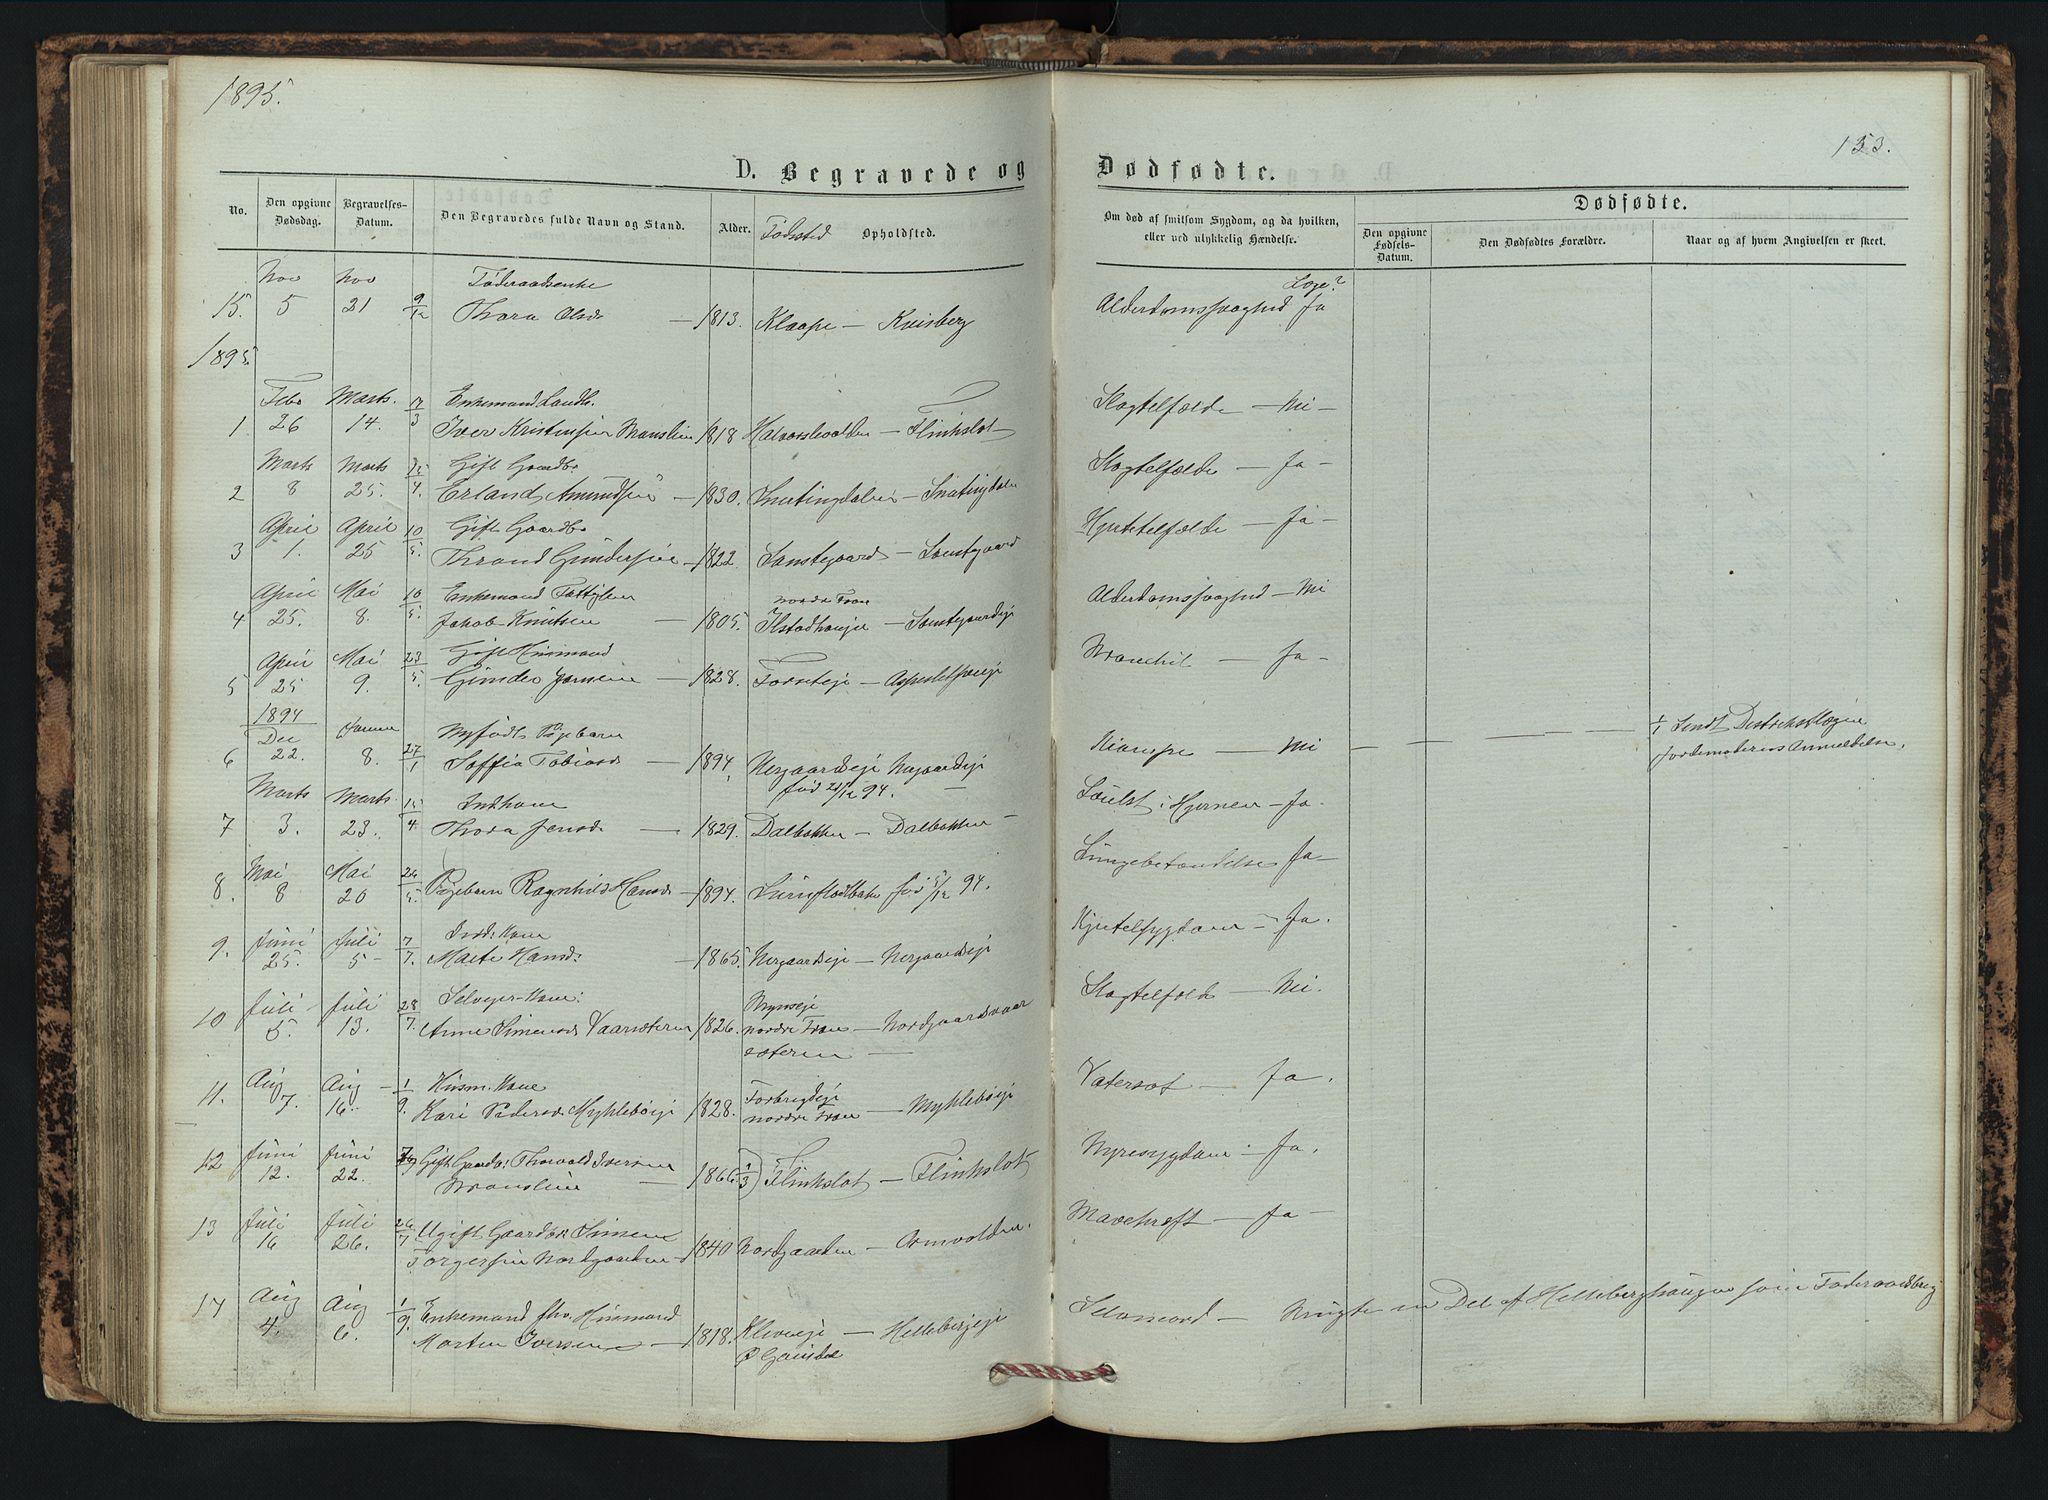 SAH, Vestre Gausdal prestekontor, Klokkerbok nr. 2, 1874-1897, s. 153